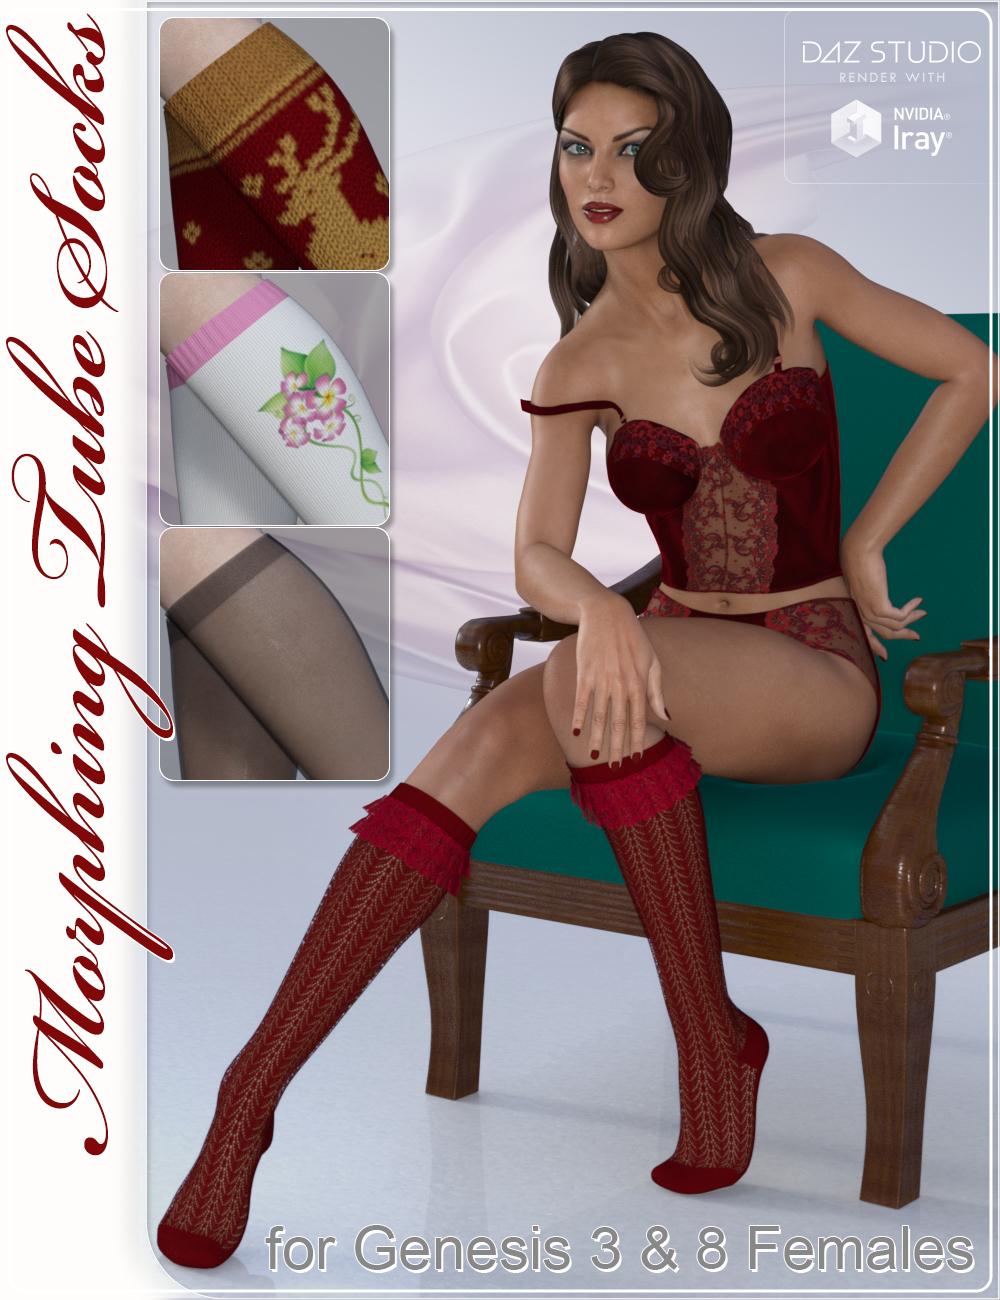 Tube Socks for Genesis 3 and Genesis 8 Female(s) by: CJ-Studio, 3D Models by Daz 3D